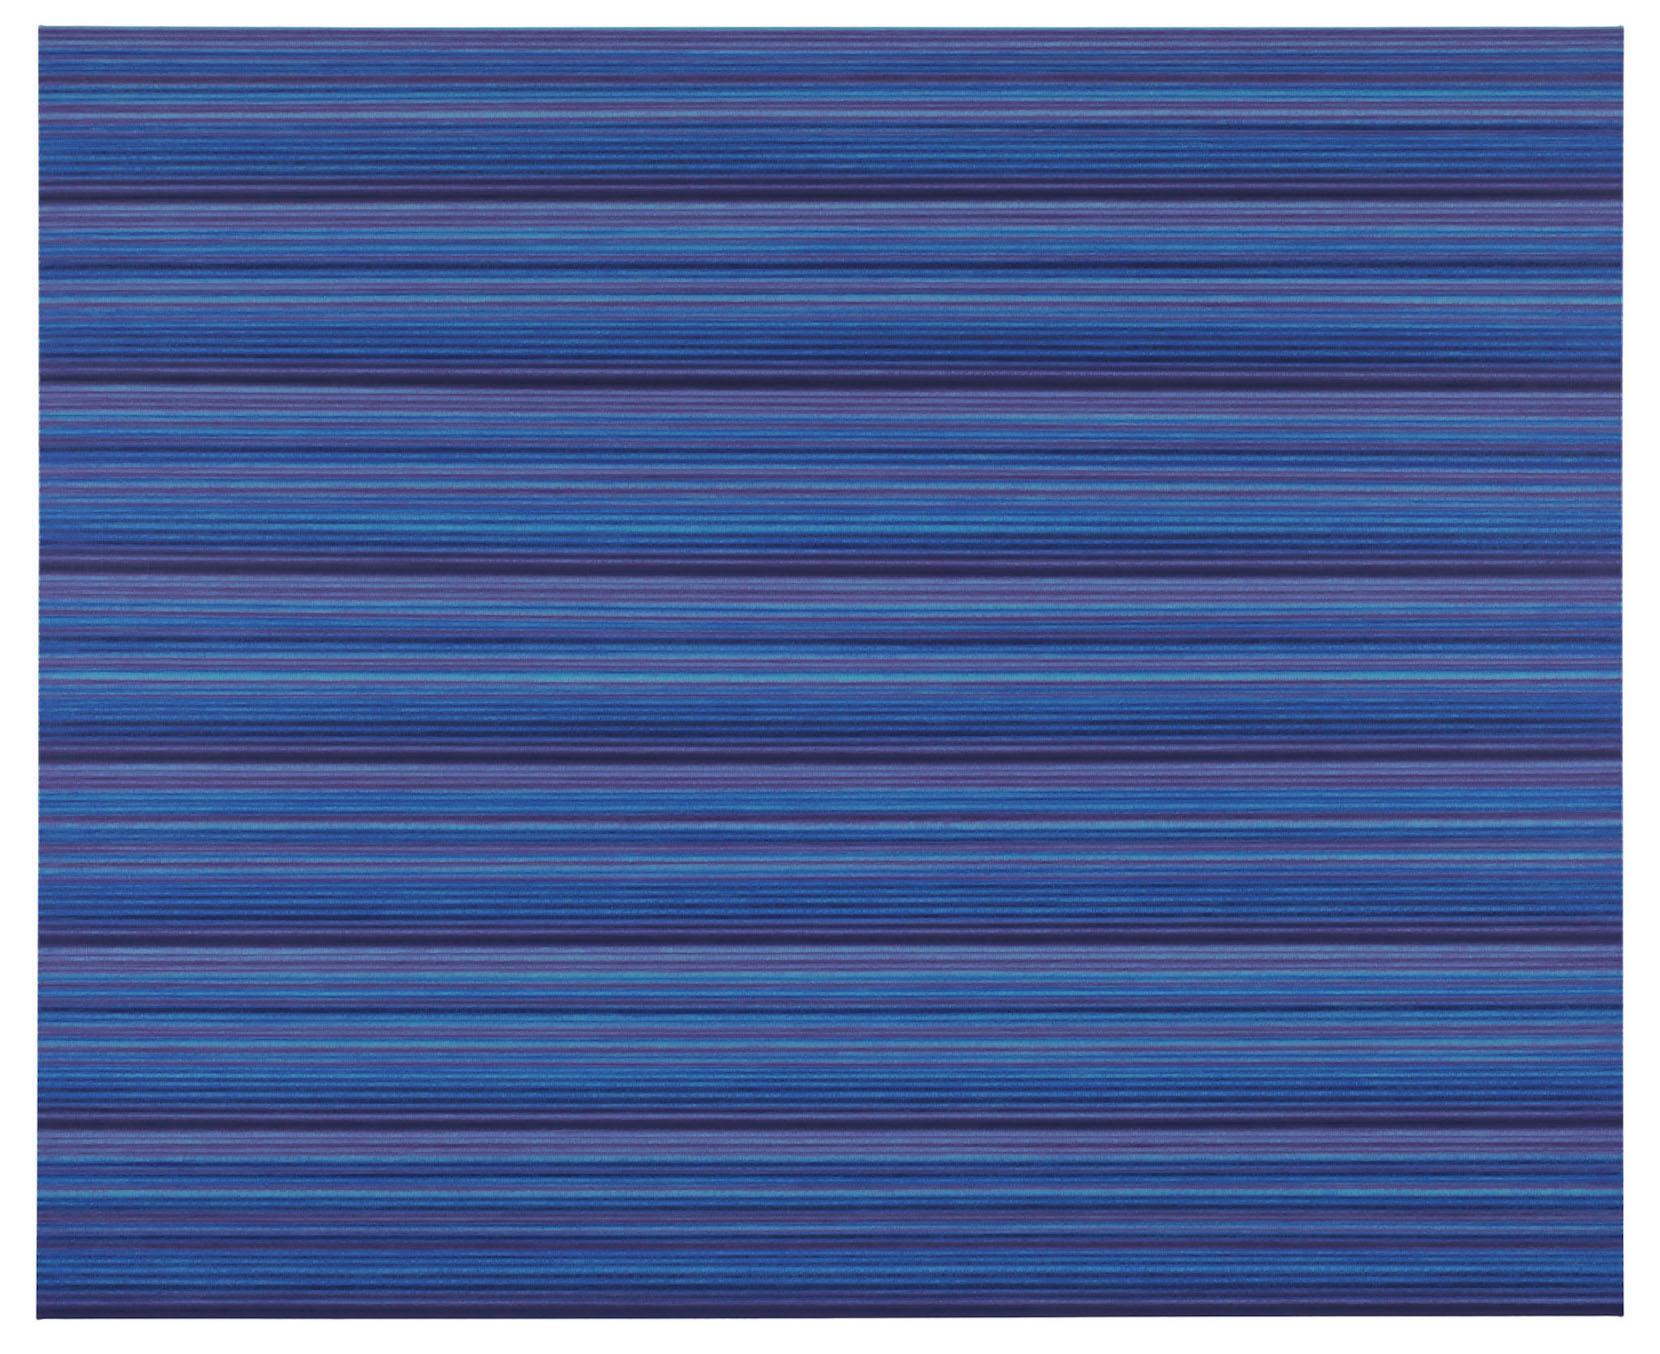 "Rickard Sollman, ""syskonet (blå)"", 2012, oil on canvas, 130 x 160 cm"